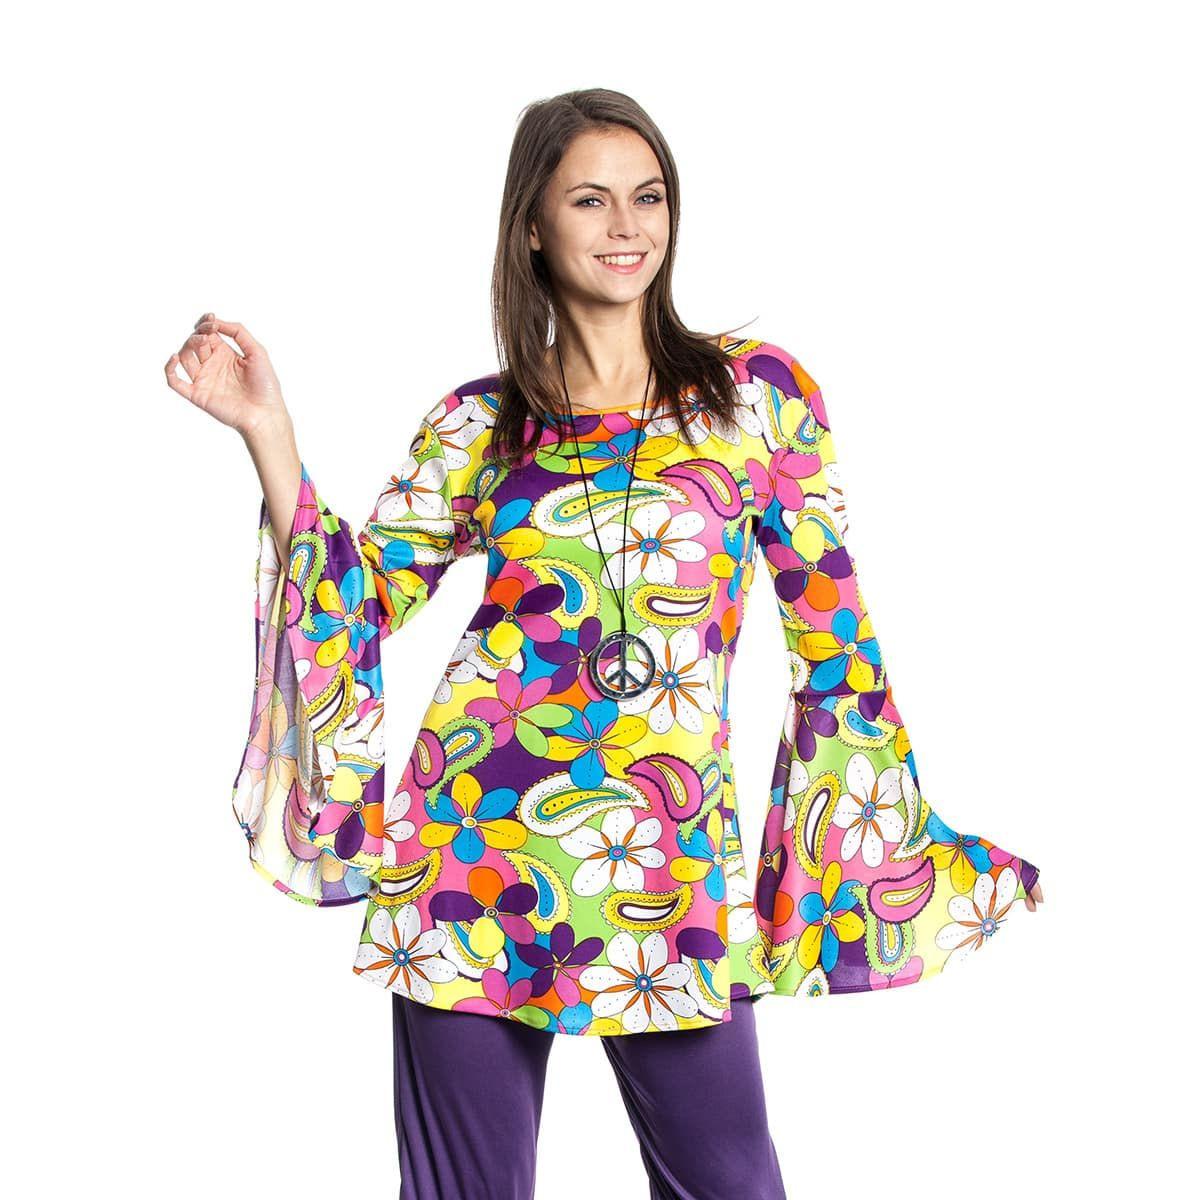 Hippie Top Damen Kostüm  Kostümplanet®